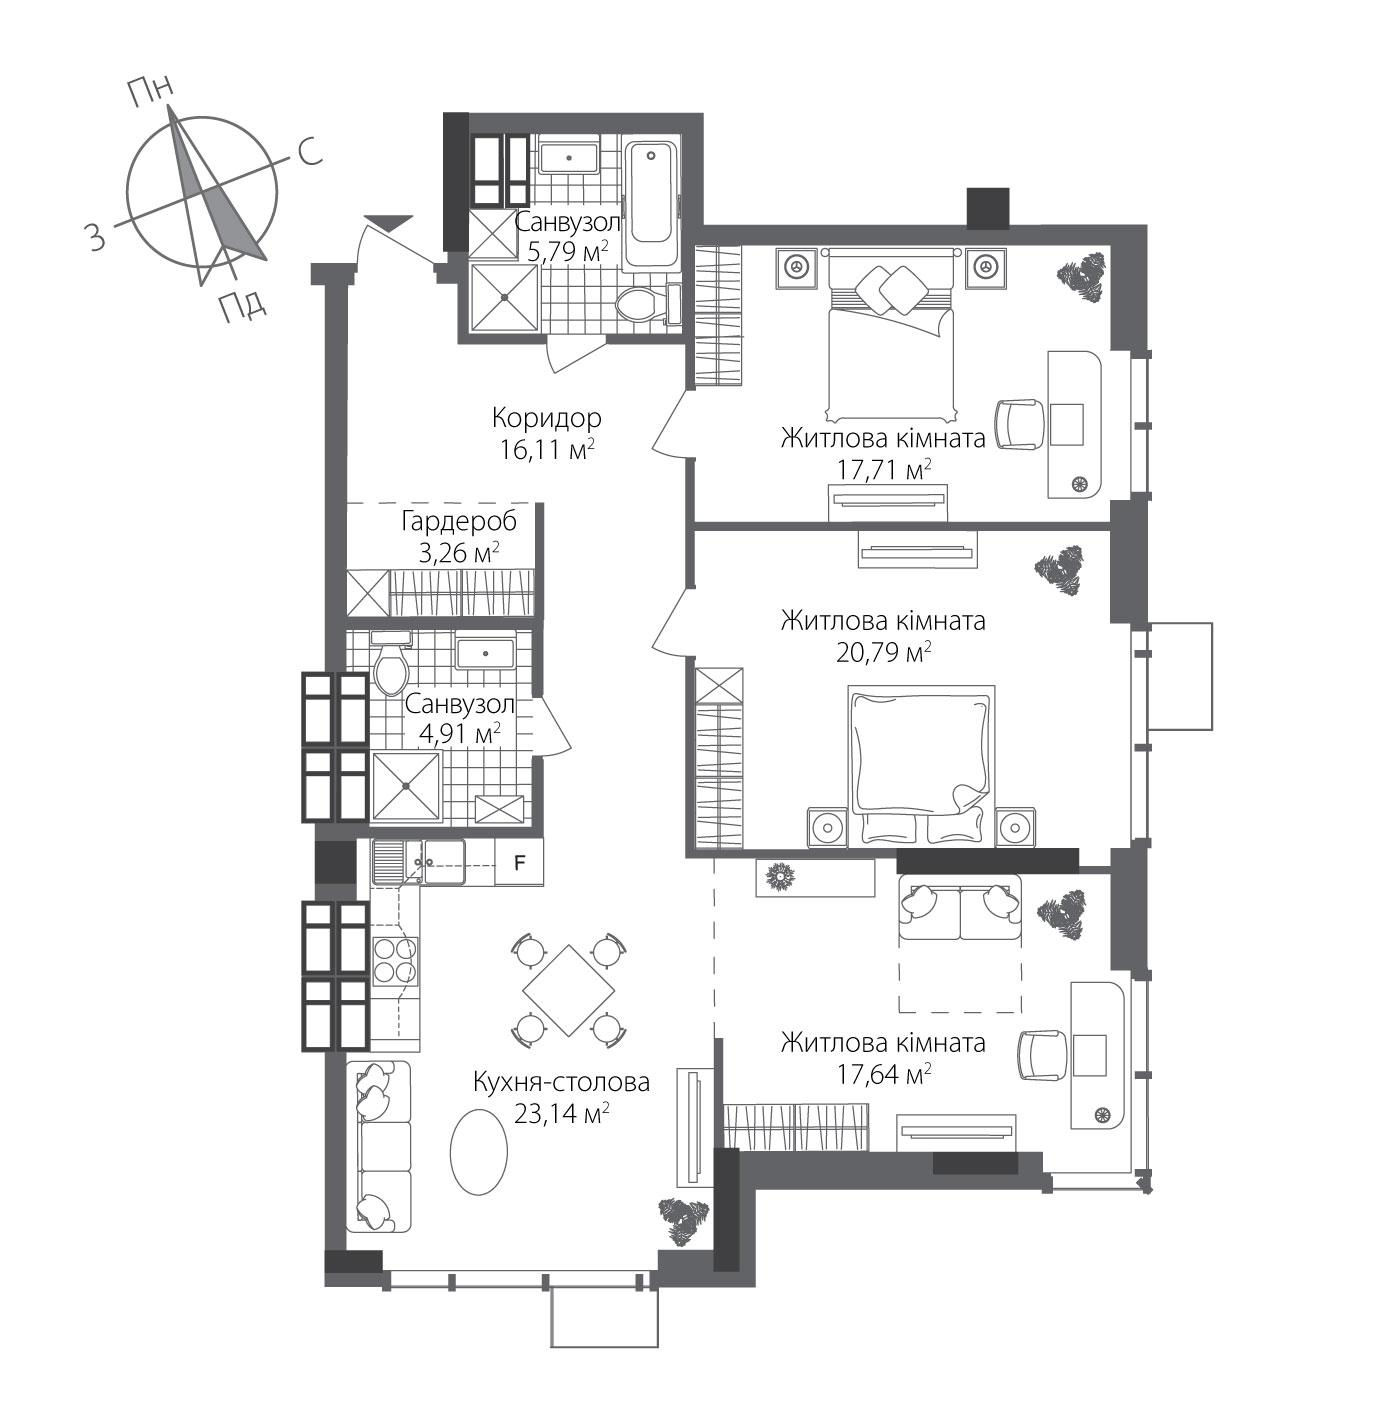 Номер квартири №1802, Будинок 8, Поверх 18, Повна площа 109,34